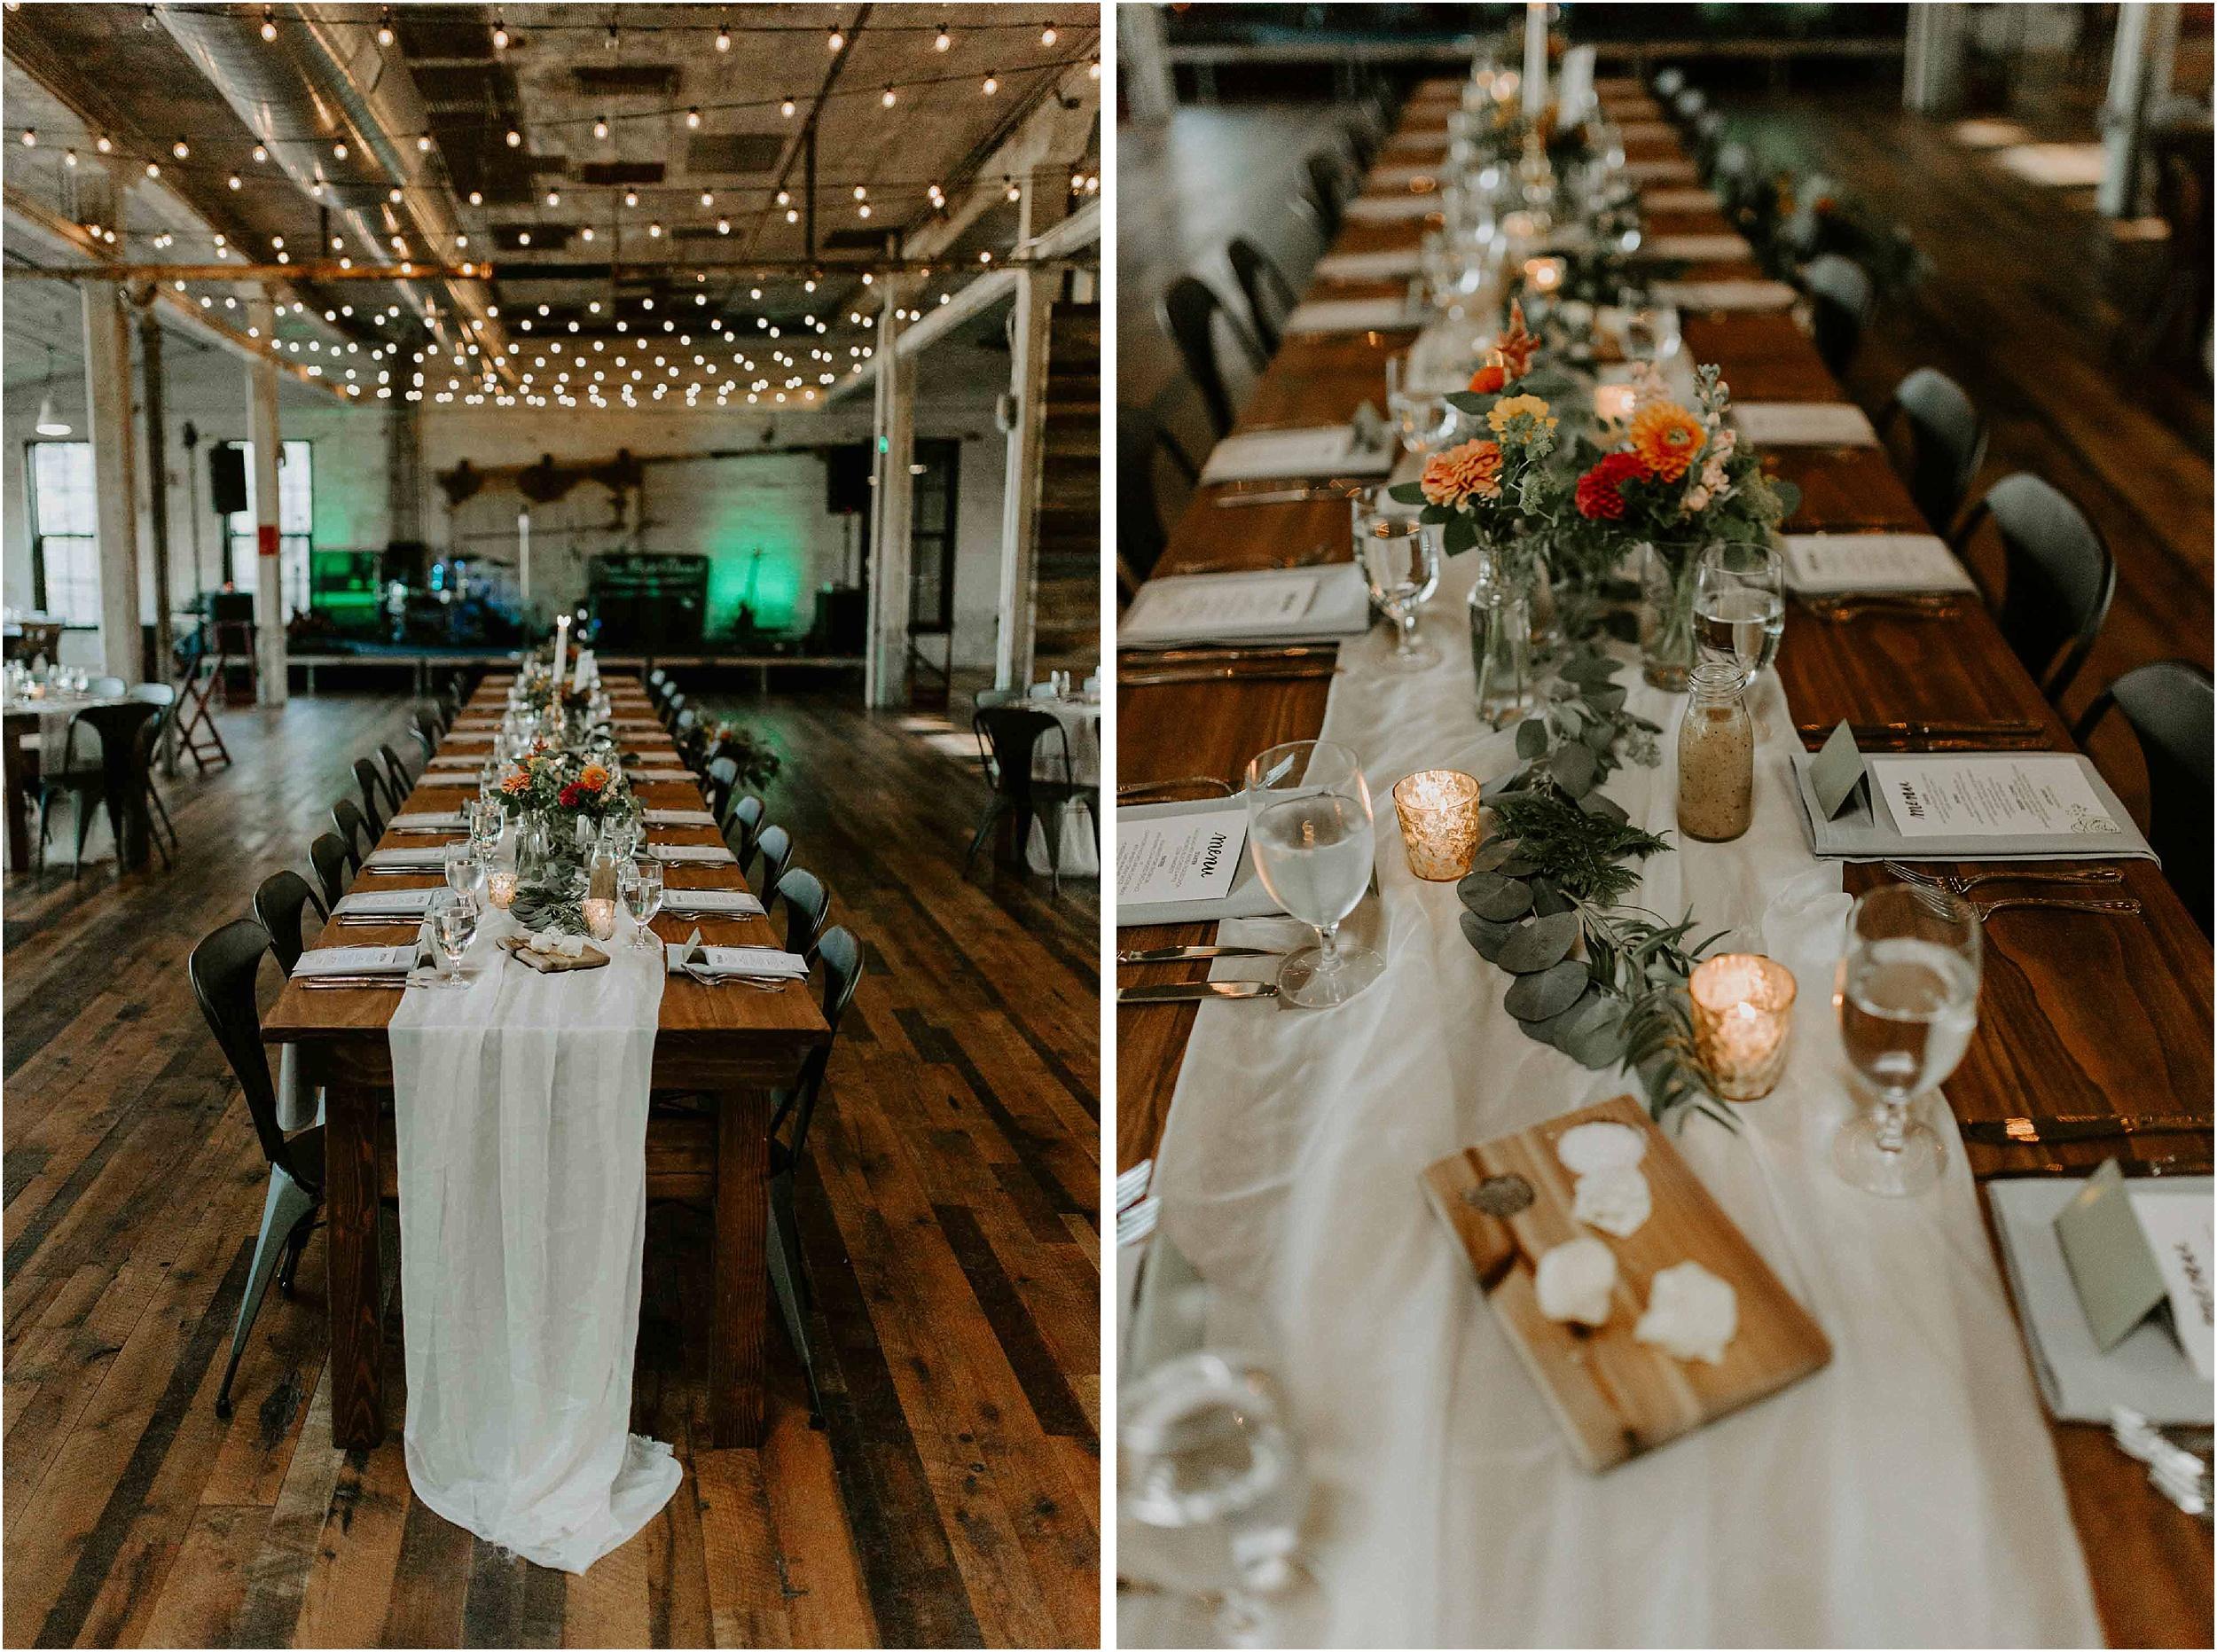 journeyman_distillery_wedding_photographer_chicago_il_wright_photographs-4091.jpg